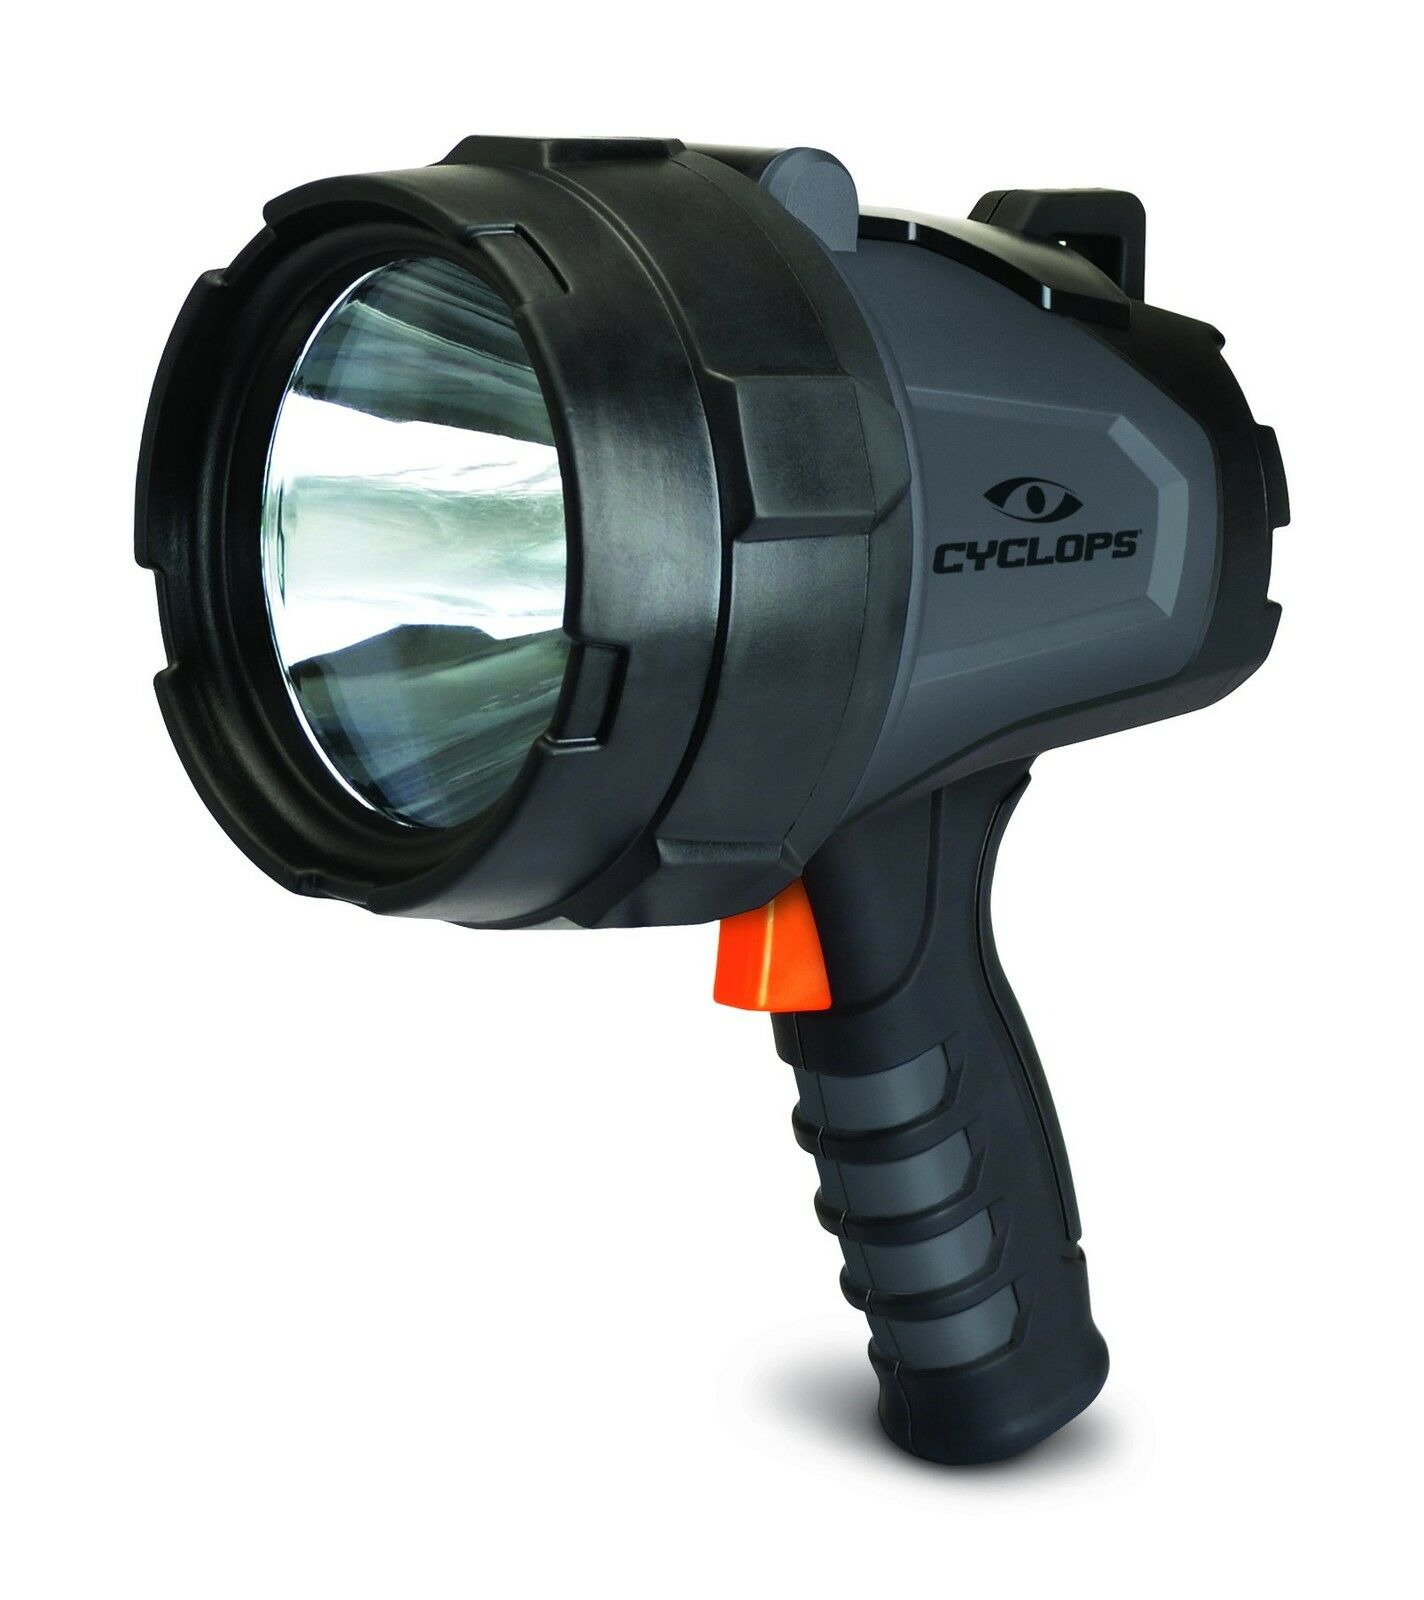 Cyclops Cyc-580hhs 580-lumen Spotlight Handheld Rechargeable Spotlight 580-lumen (cyc580hhs) 2c1a37